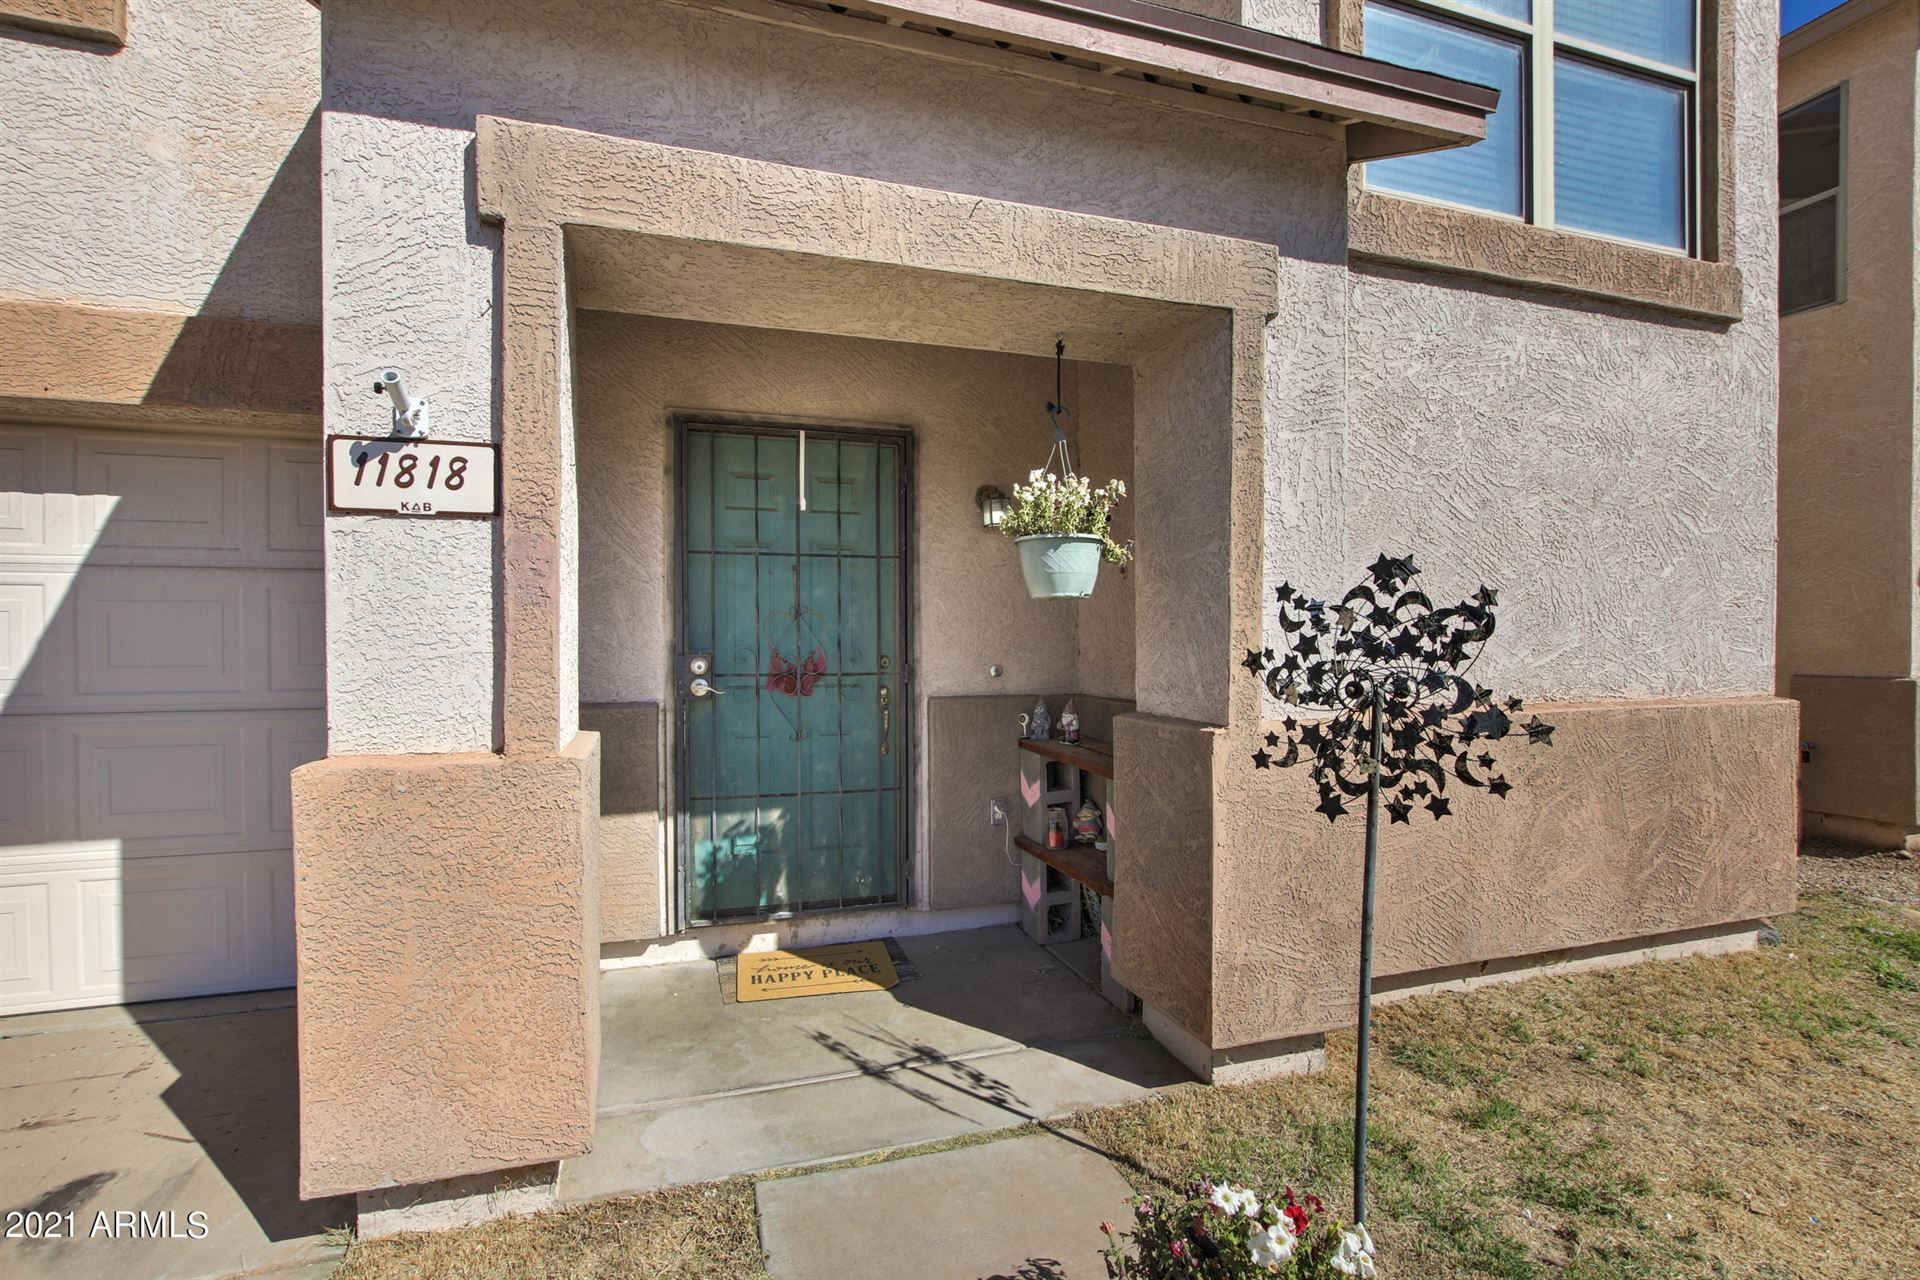 Photo of 11818 W WINDROSE Avenue, El Mirage, AZ 85335 (MLS # 6199769)